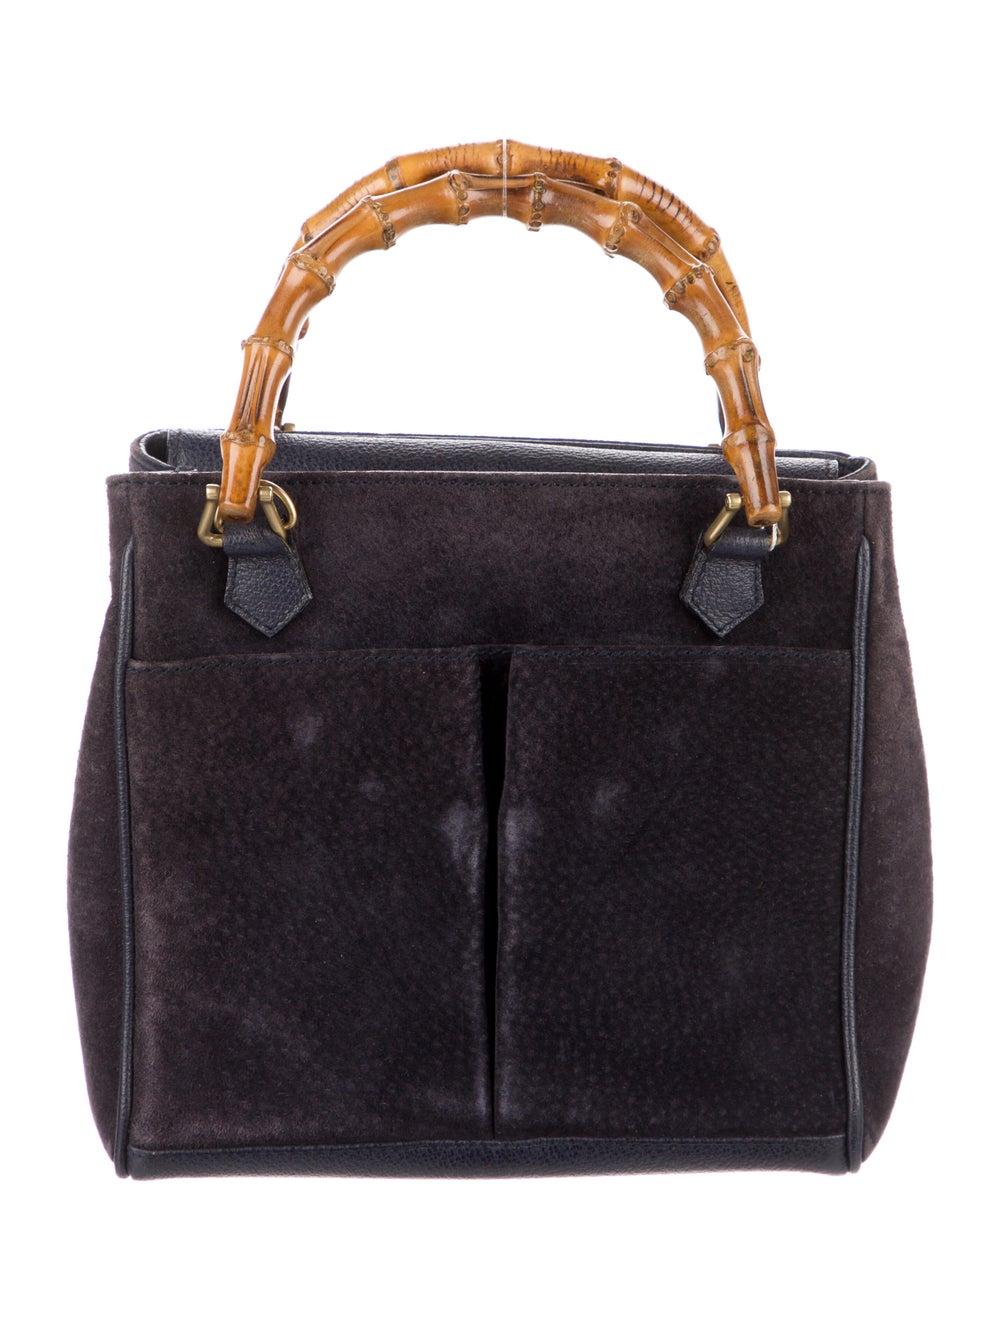 Gucci Vintage Mini Bamboo Handle Bag Blue - image 1